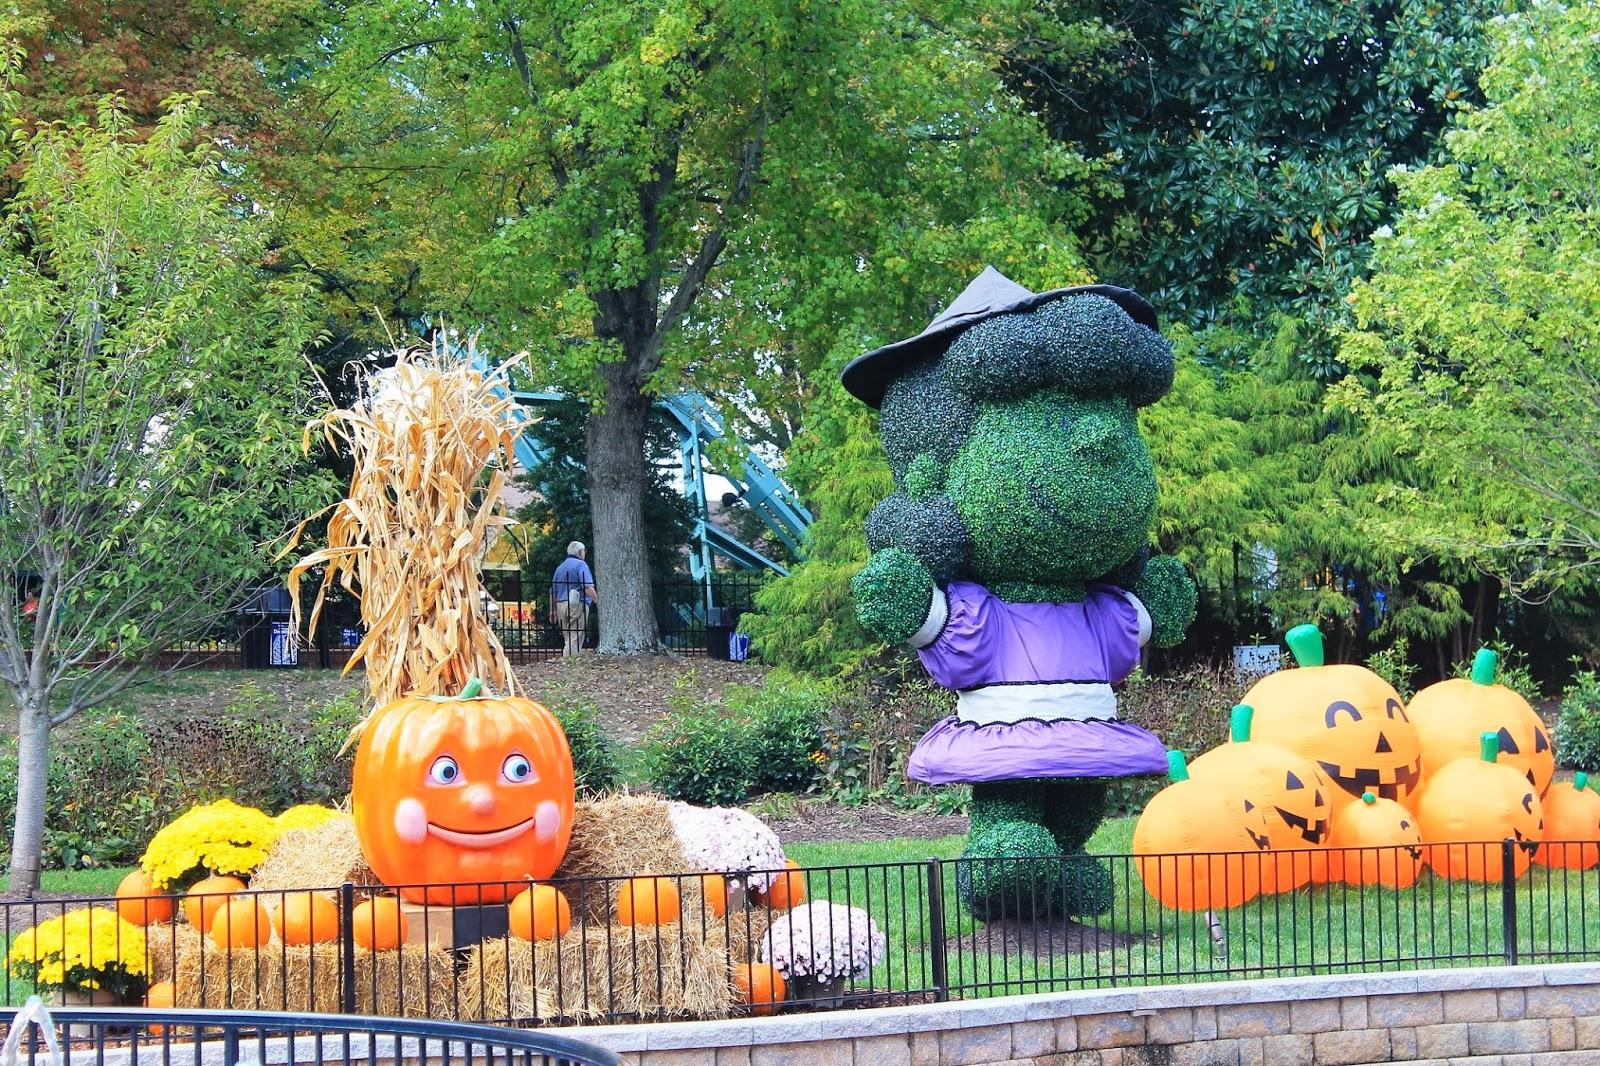 Peanuts Halloween Decorations